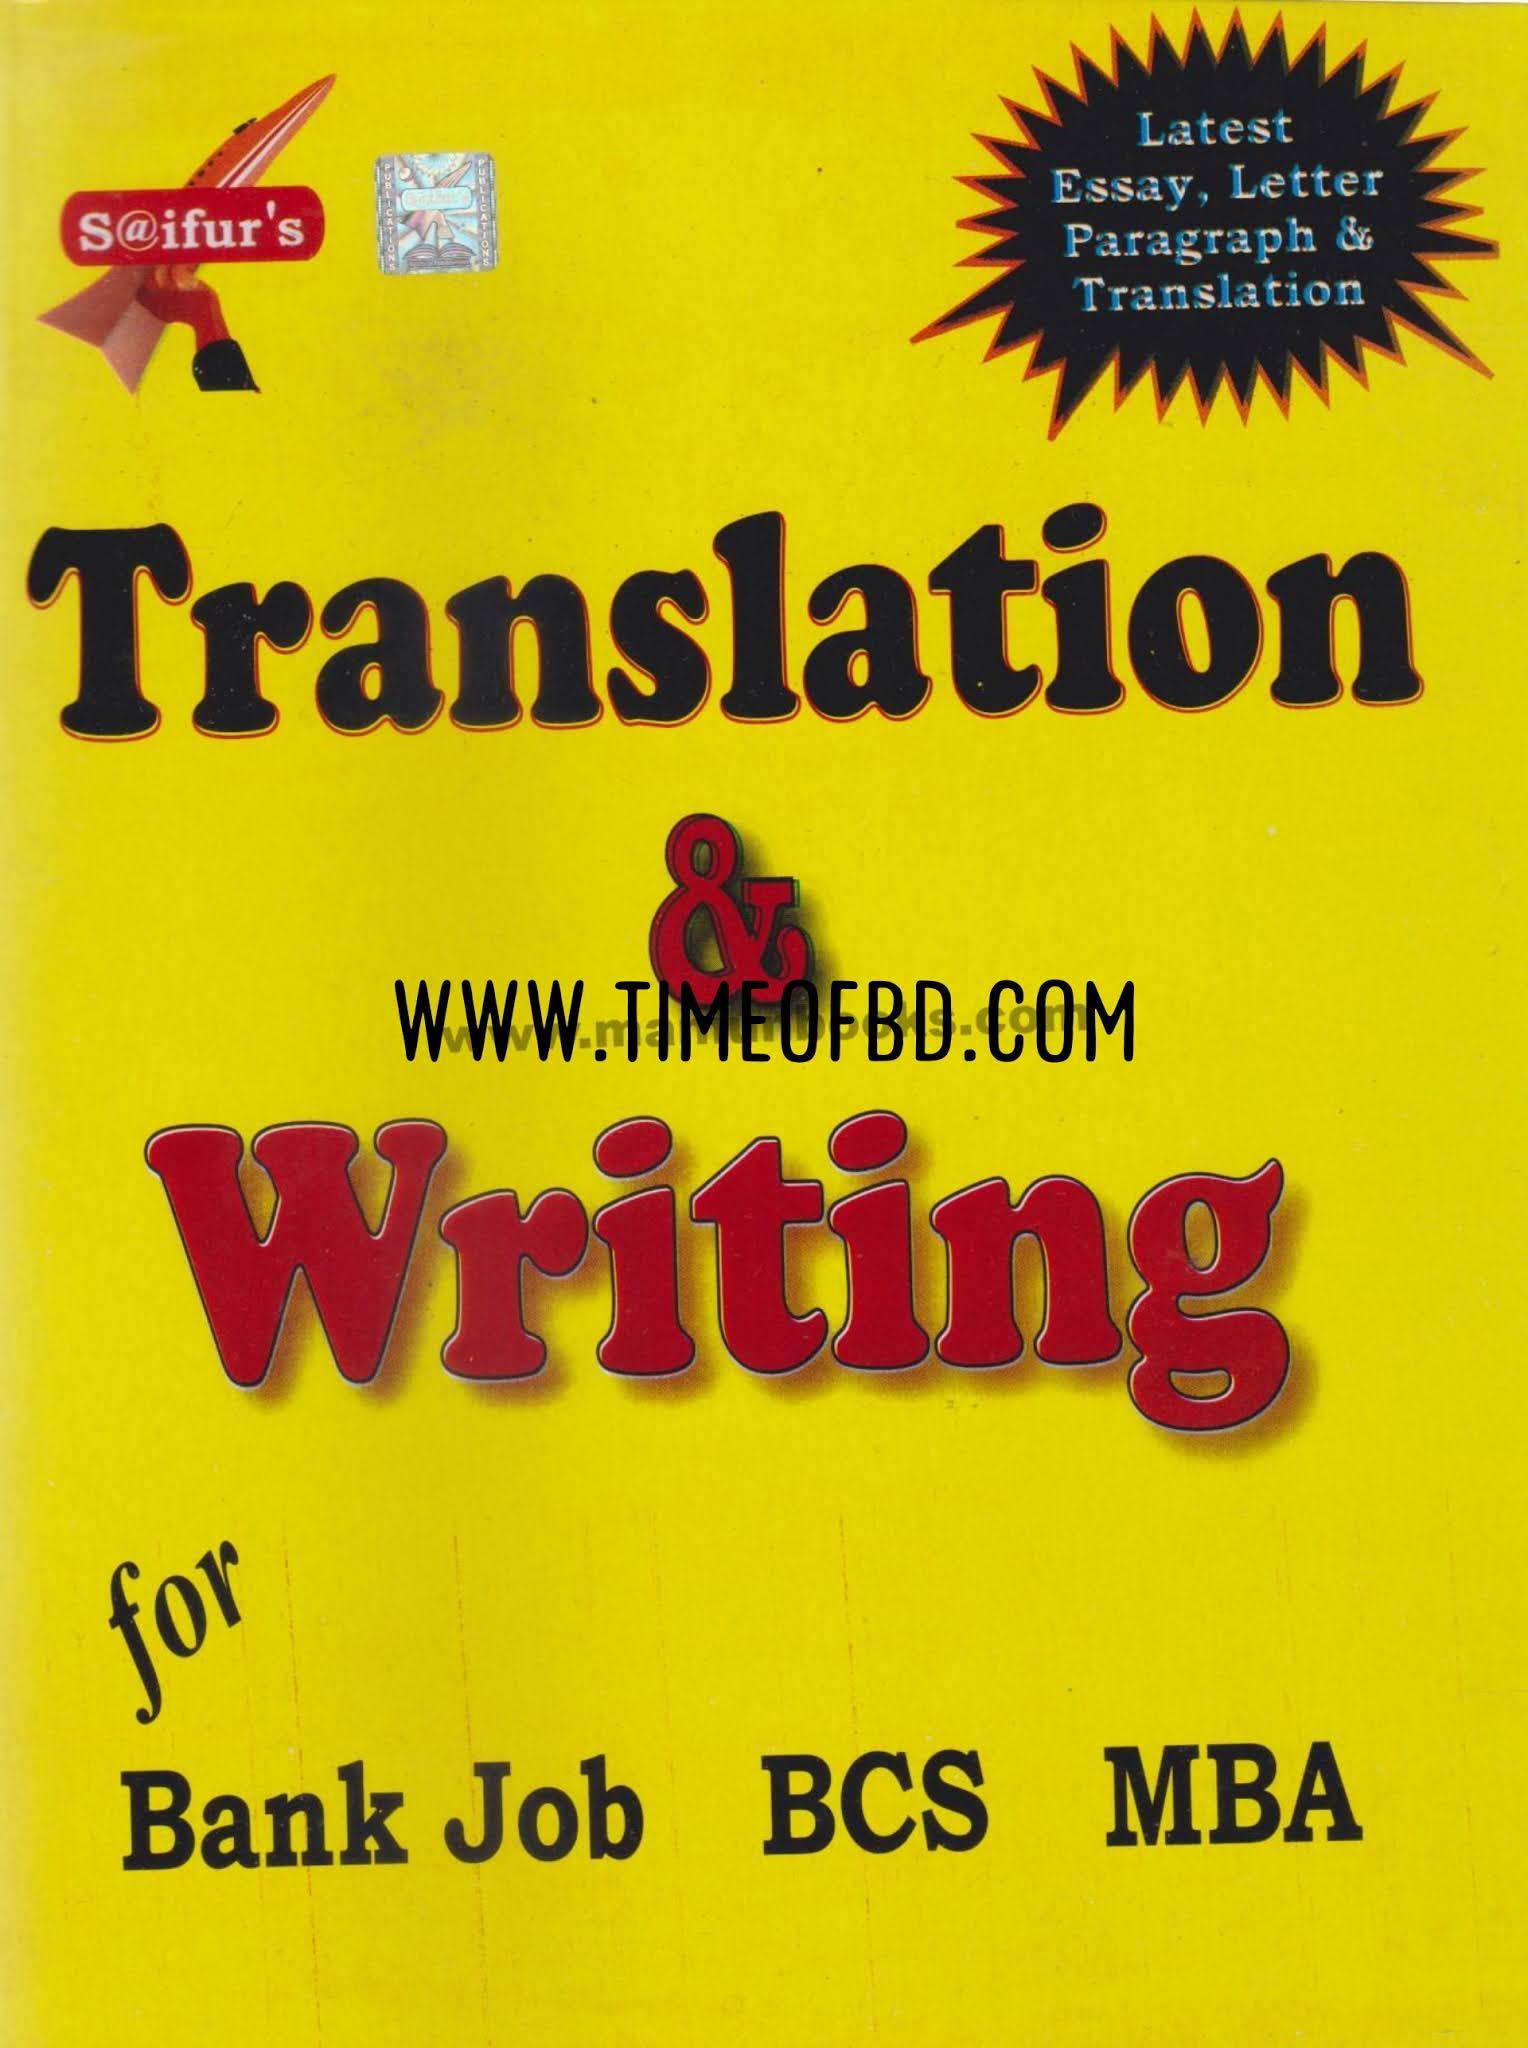 Saifur translation and writing book pdf, Saifur translation and writing book pdf download, Saifur translation and writing book price, Saifur translation and writing book online order link